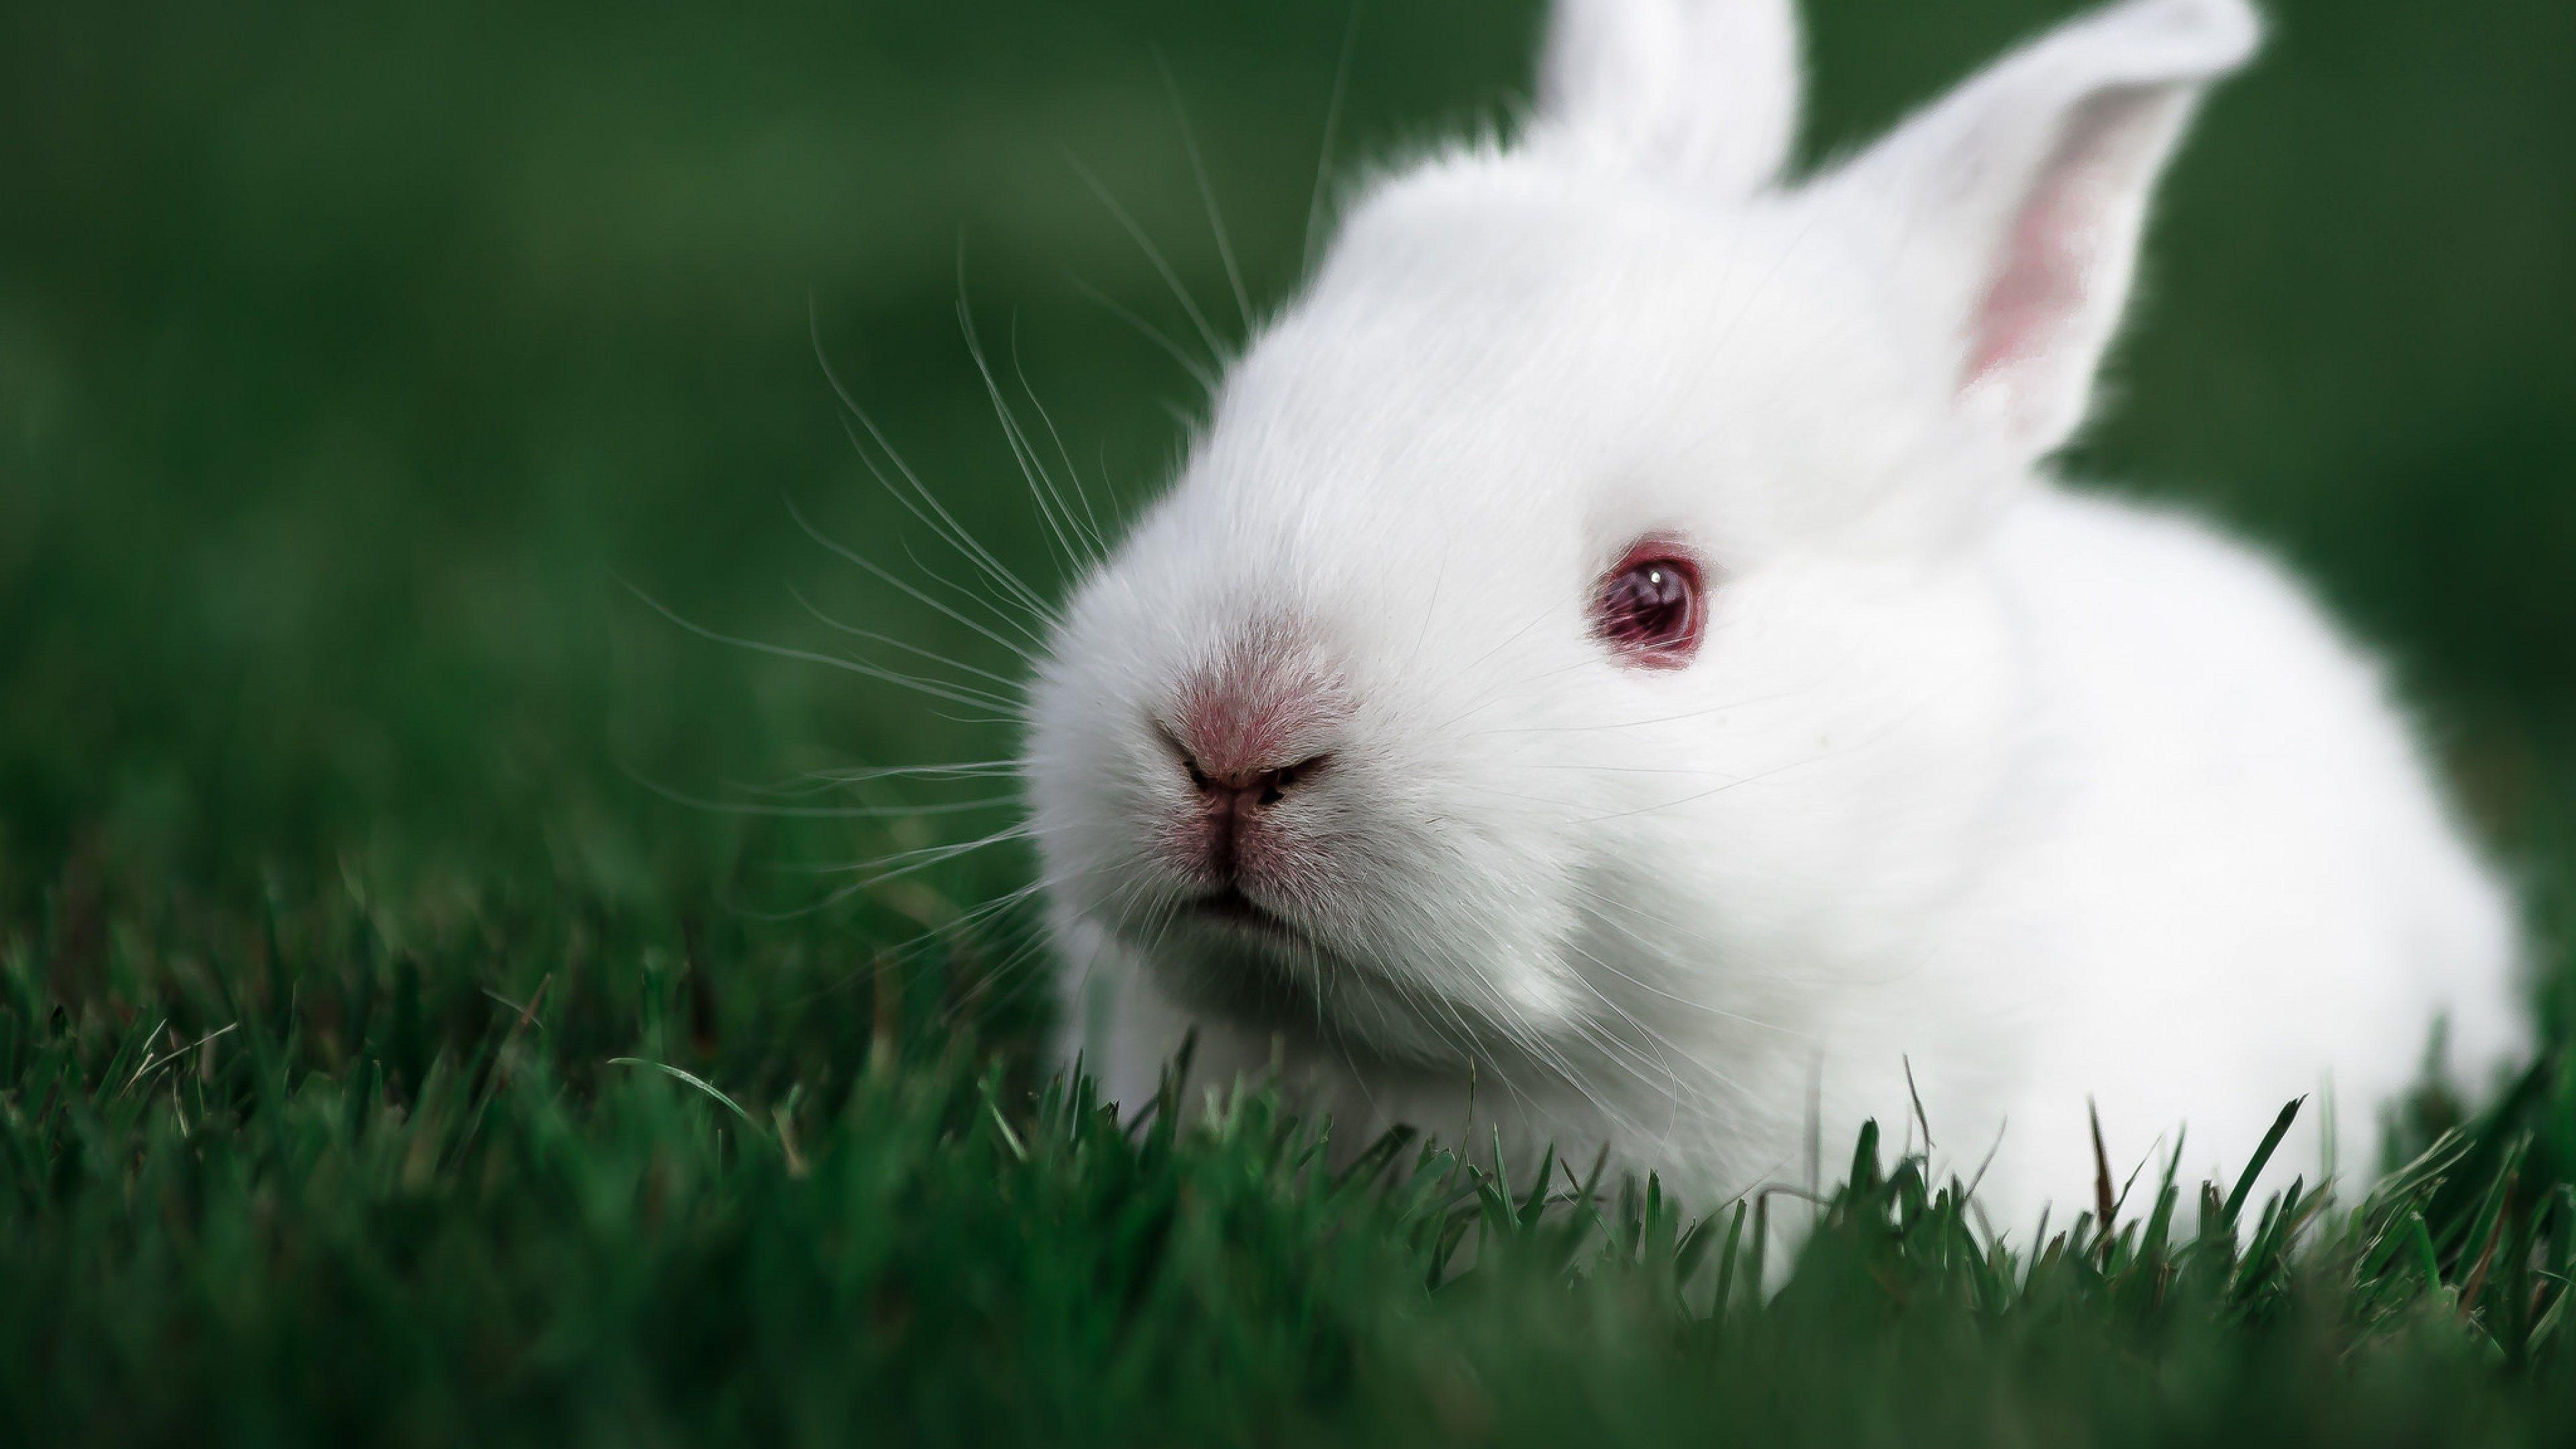 Bunnies Animals 1920x1200 Wallpaper Rabbit Wallpaper Beautiful Rabbit Animals